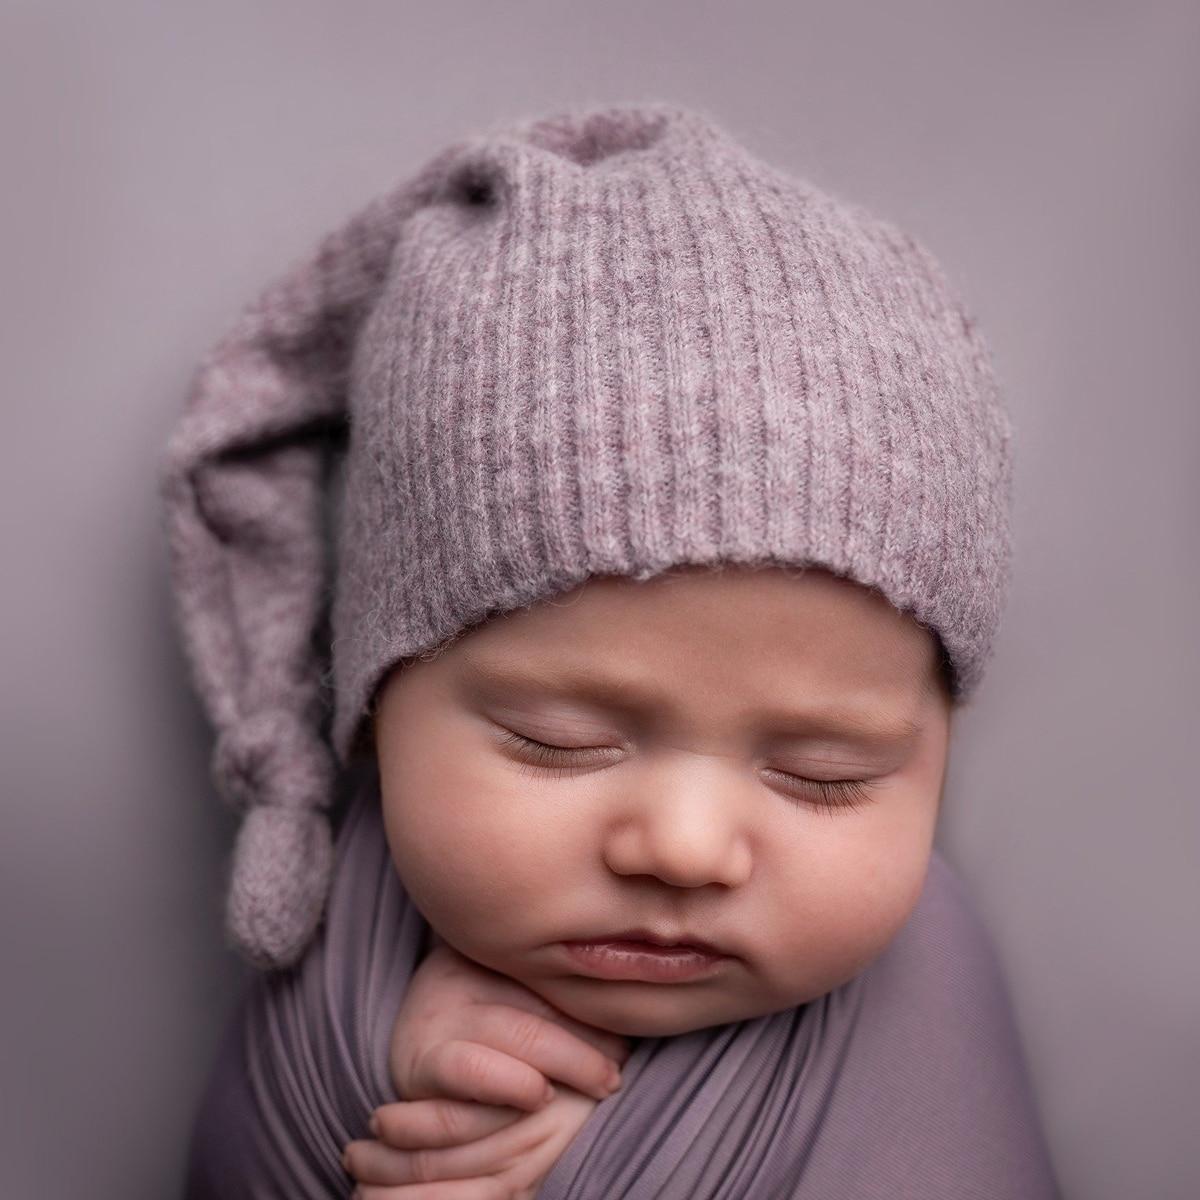 Newborn-Clean-Light-Before-3